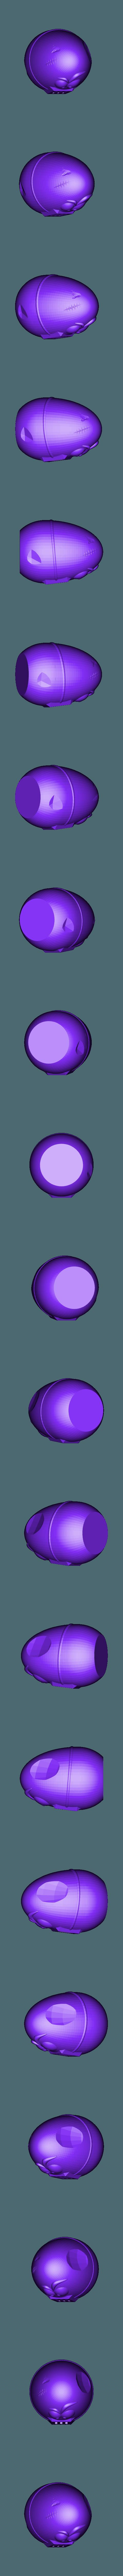 Rotton_Guy_3.stl Download free STL file Rotton Eggs! • 3D printer model, 8ran